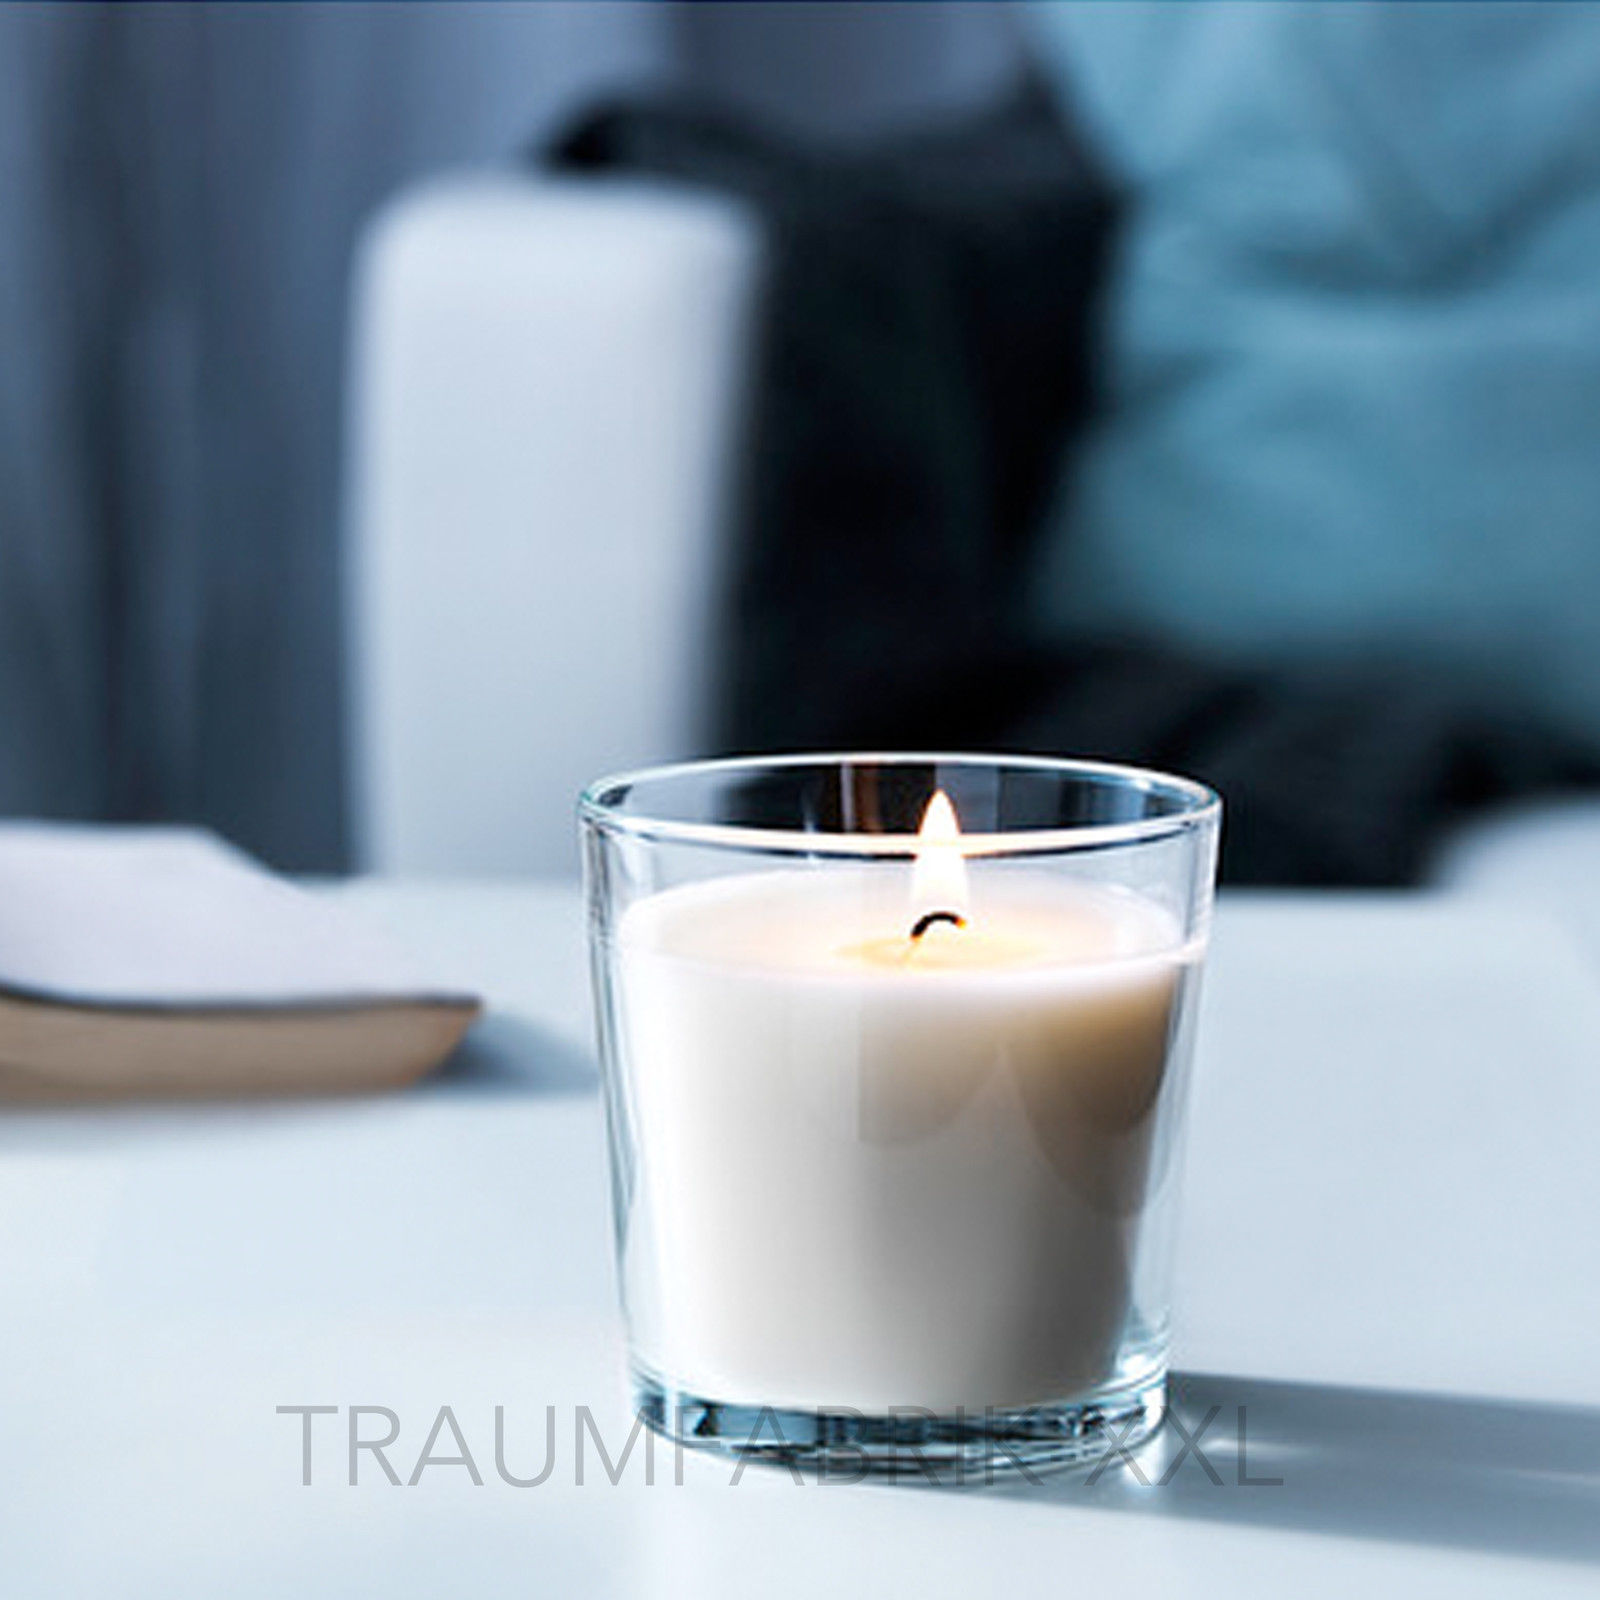 10 x duftkerze kerze im glas vanillearoma 25 std brenndauer vanille weiss neu traumfabrik xxl. Black Bedroom Furniture Sets. Home Design Ideas